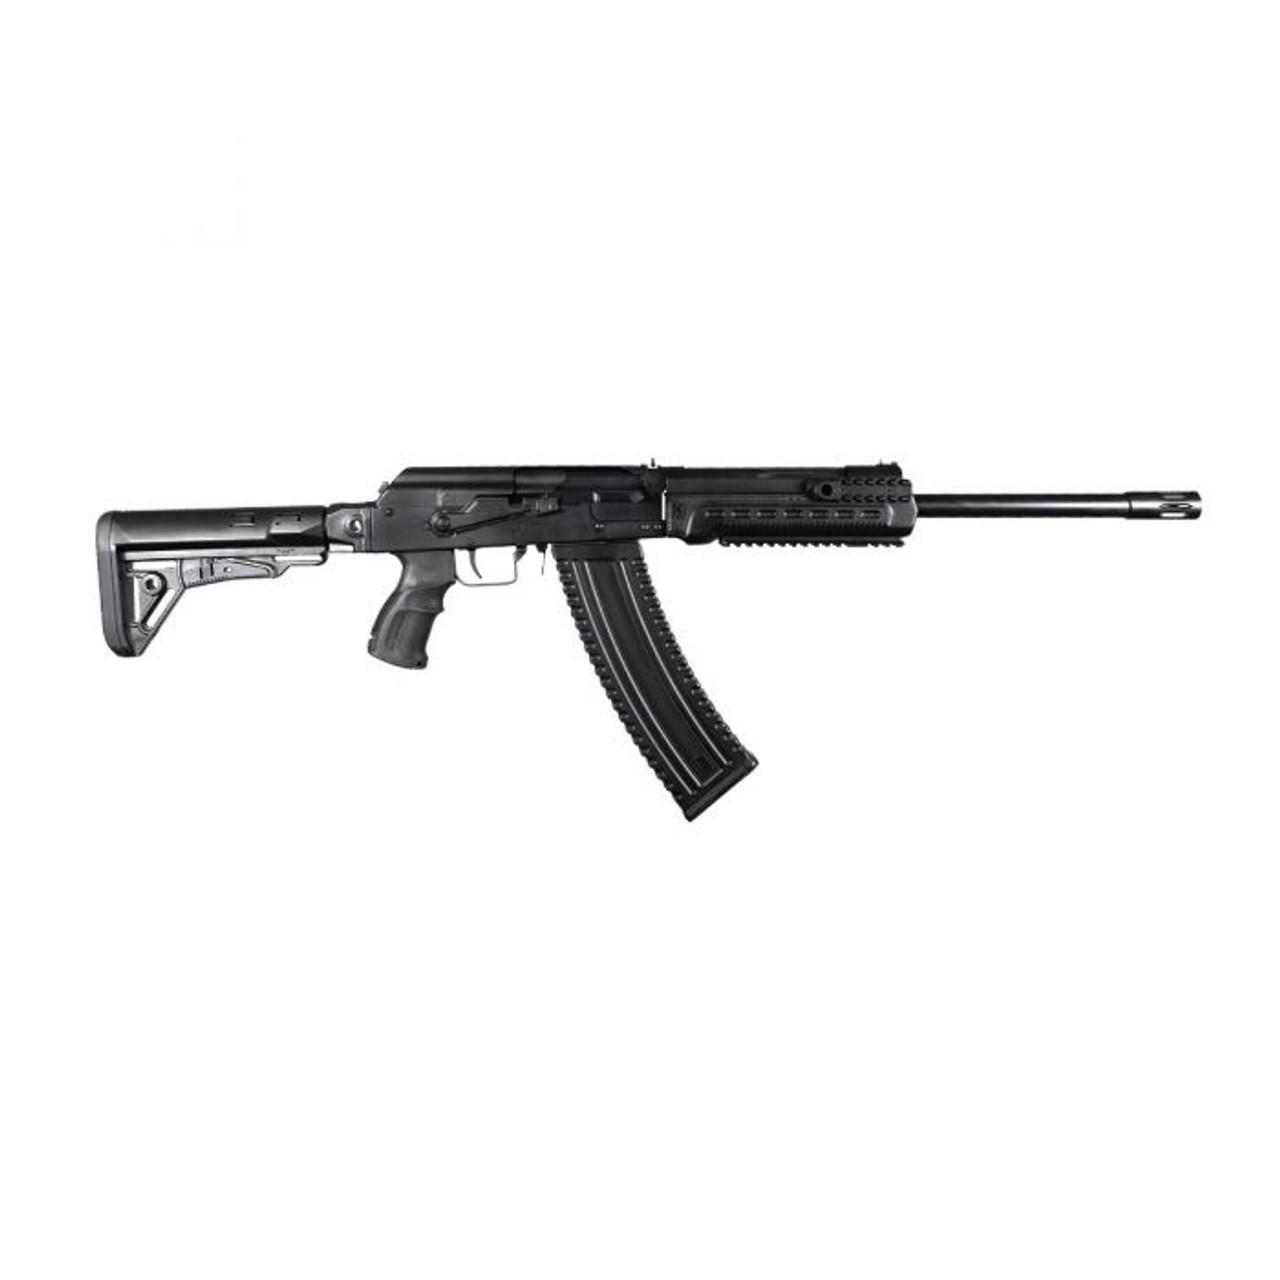 KALASHNIKOV KS12 Tactical CALIFORNIA LEGAL - 12GA